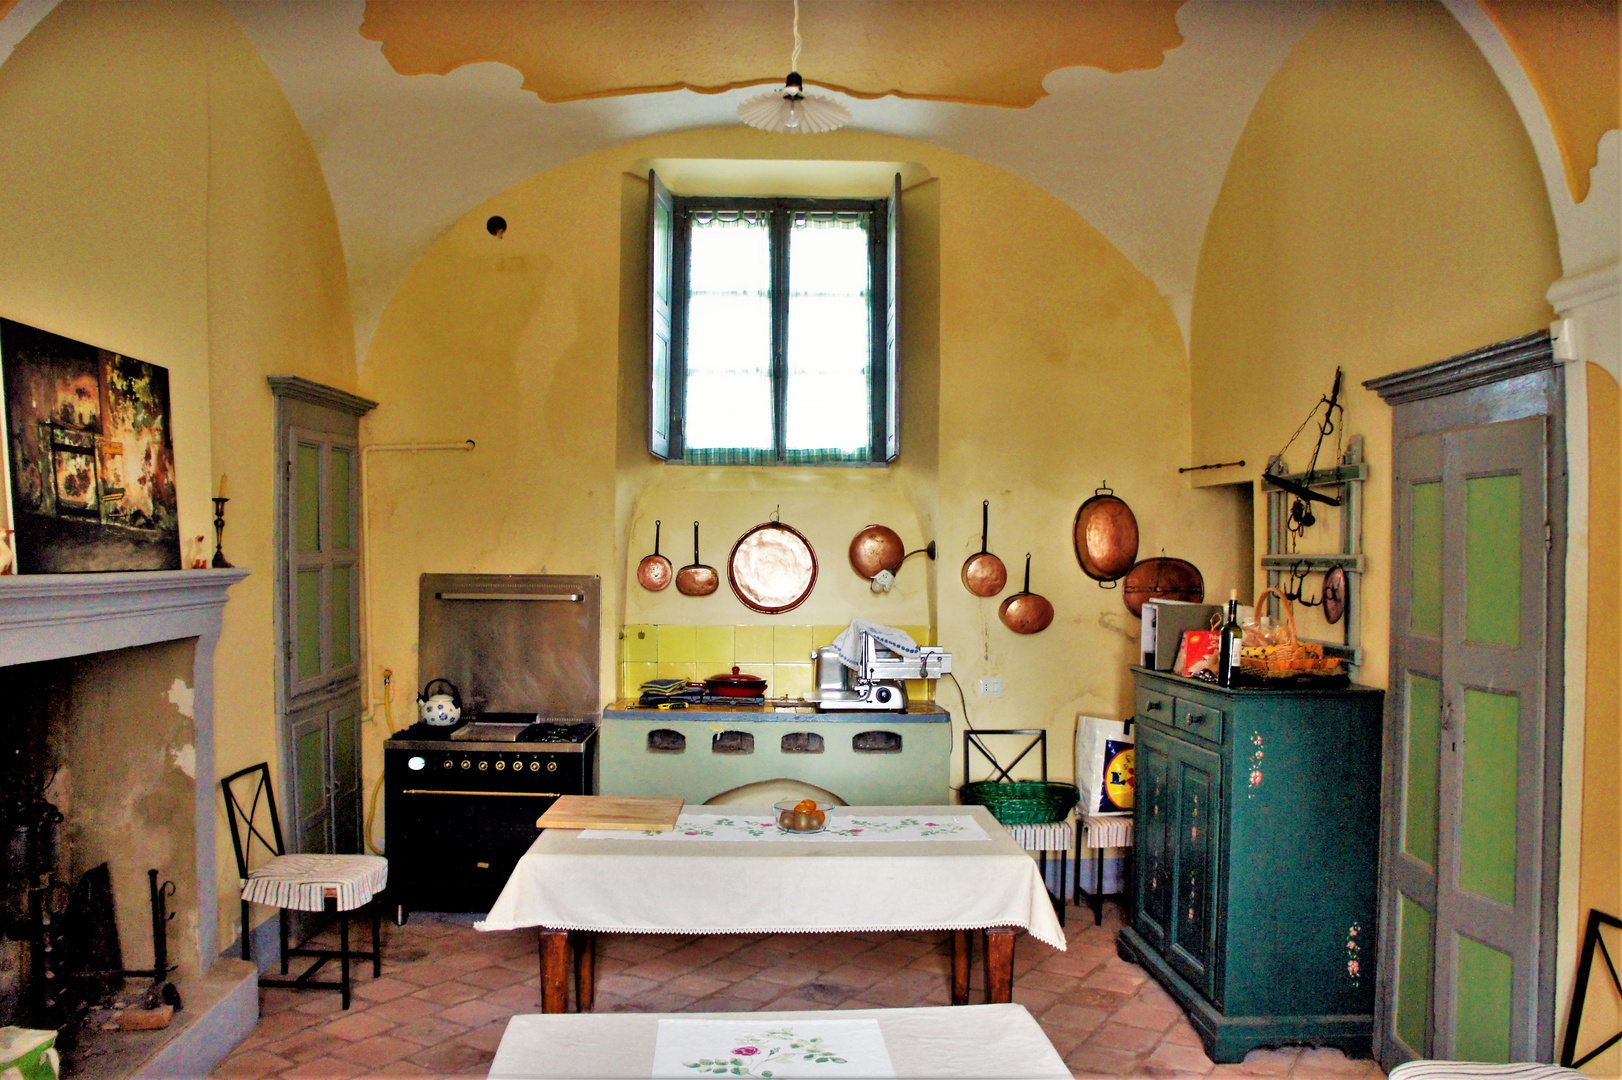 Cucina Di Campagna Foto Bild Italy Dokumentation Italien Bilder Auf Fotocommunity